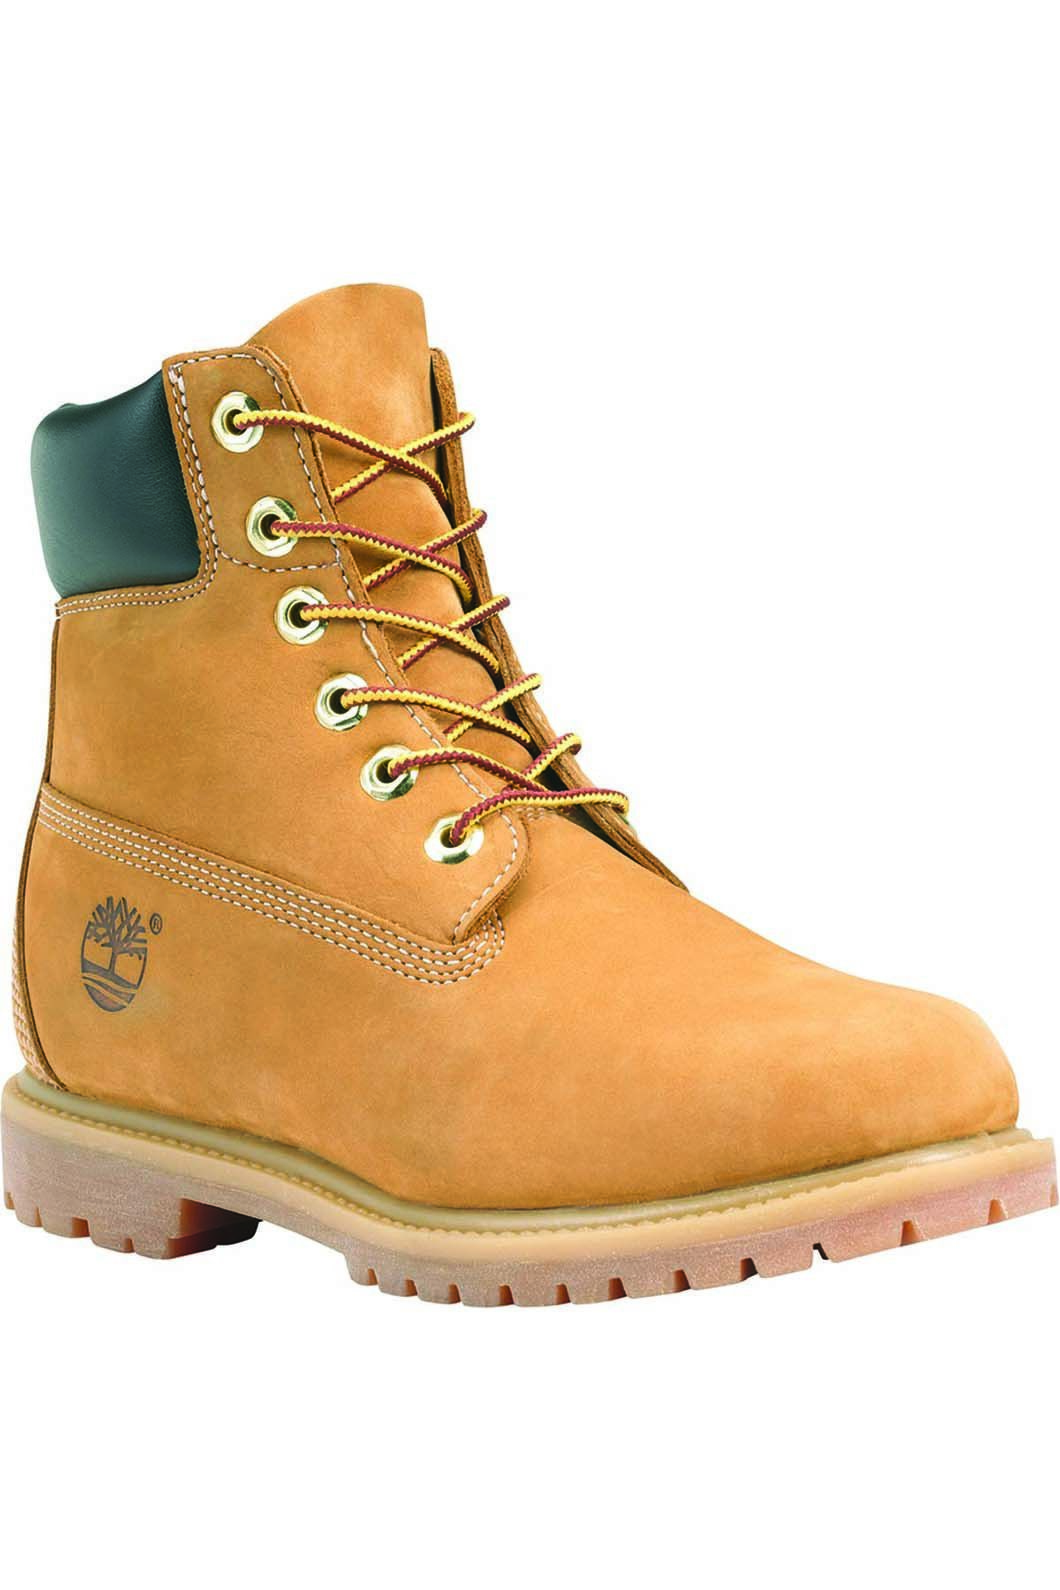 Timberland Women's Premium 6 Inch Boots Wheat, WHEAT WATERBUCK, hi-res